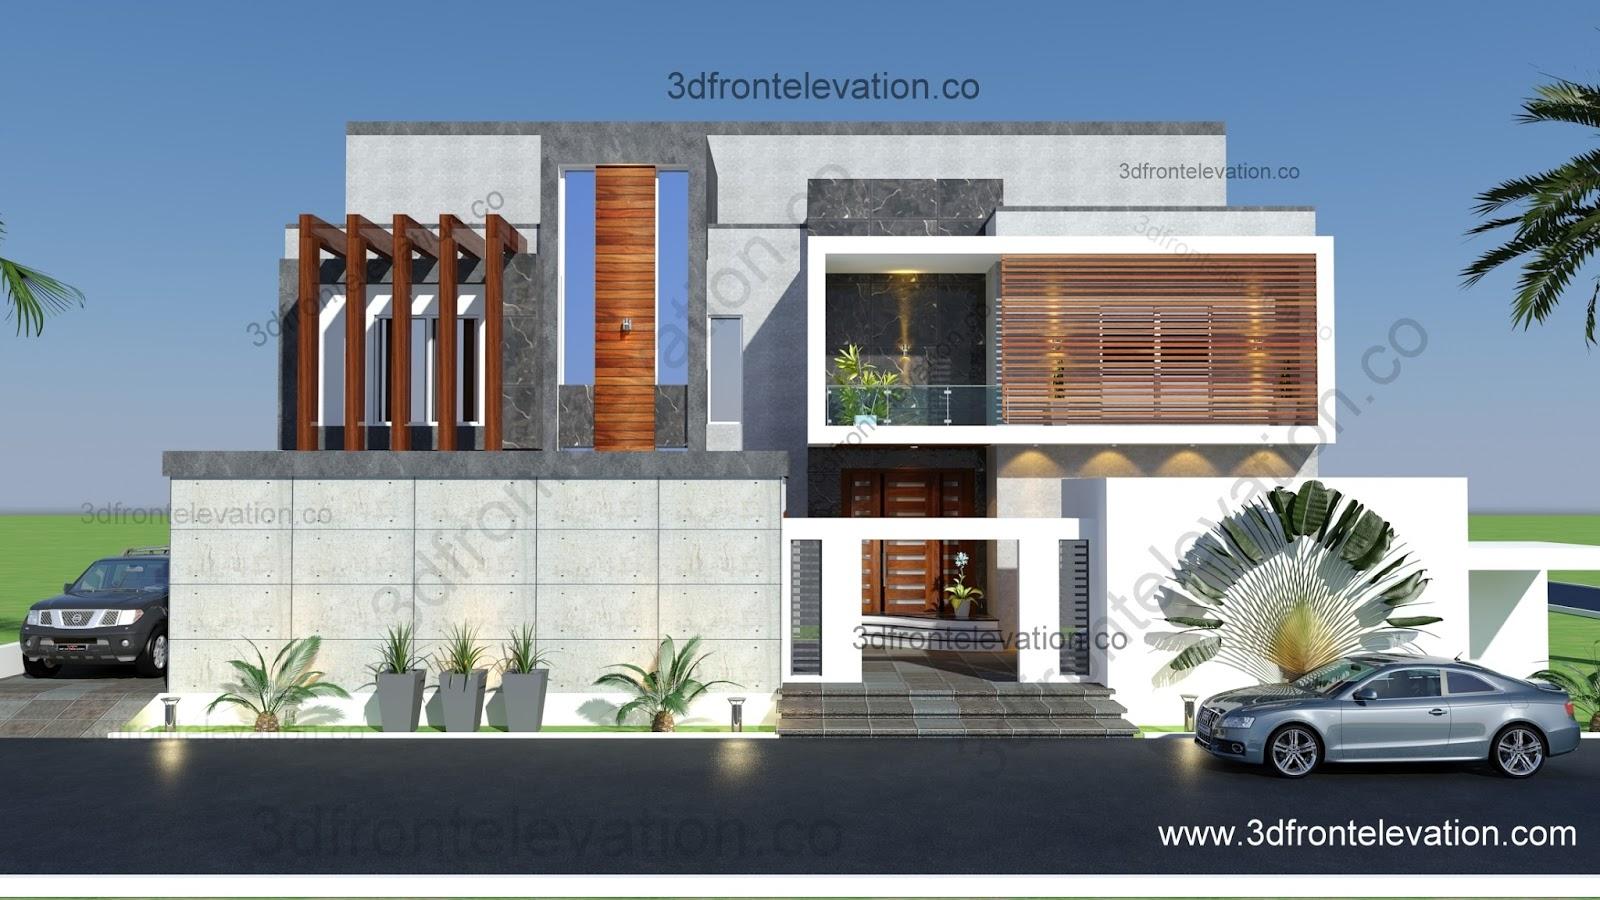 Front Elevation House Dubai : D front elevation saudi oman muscat qatar dubai